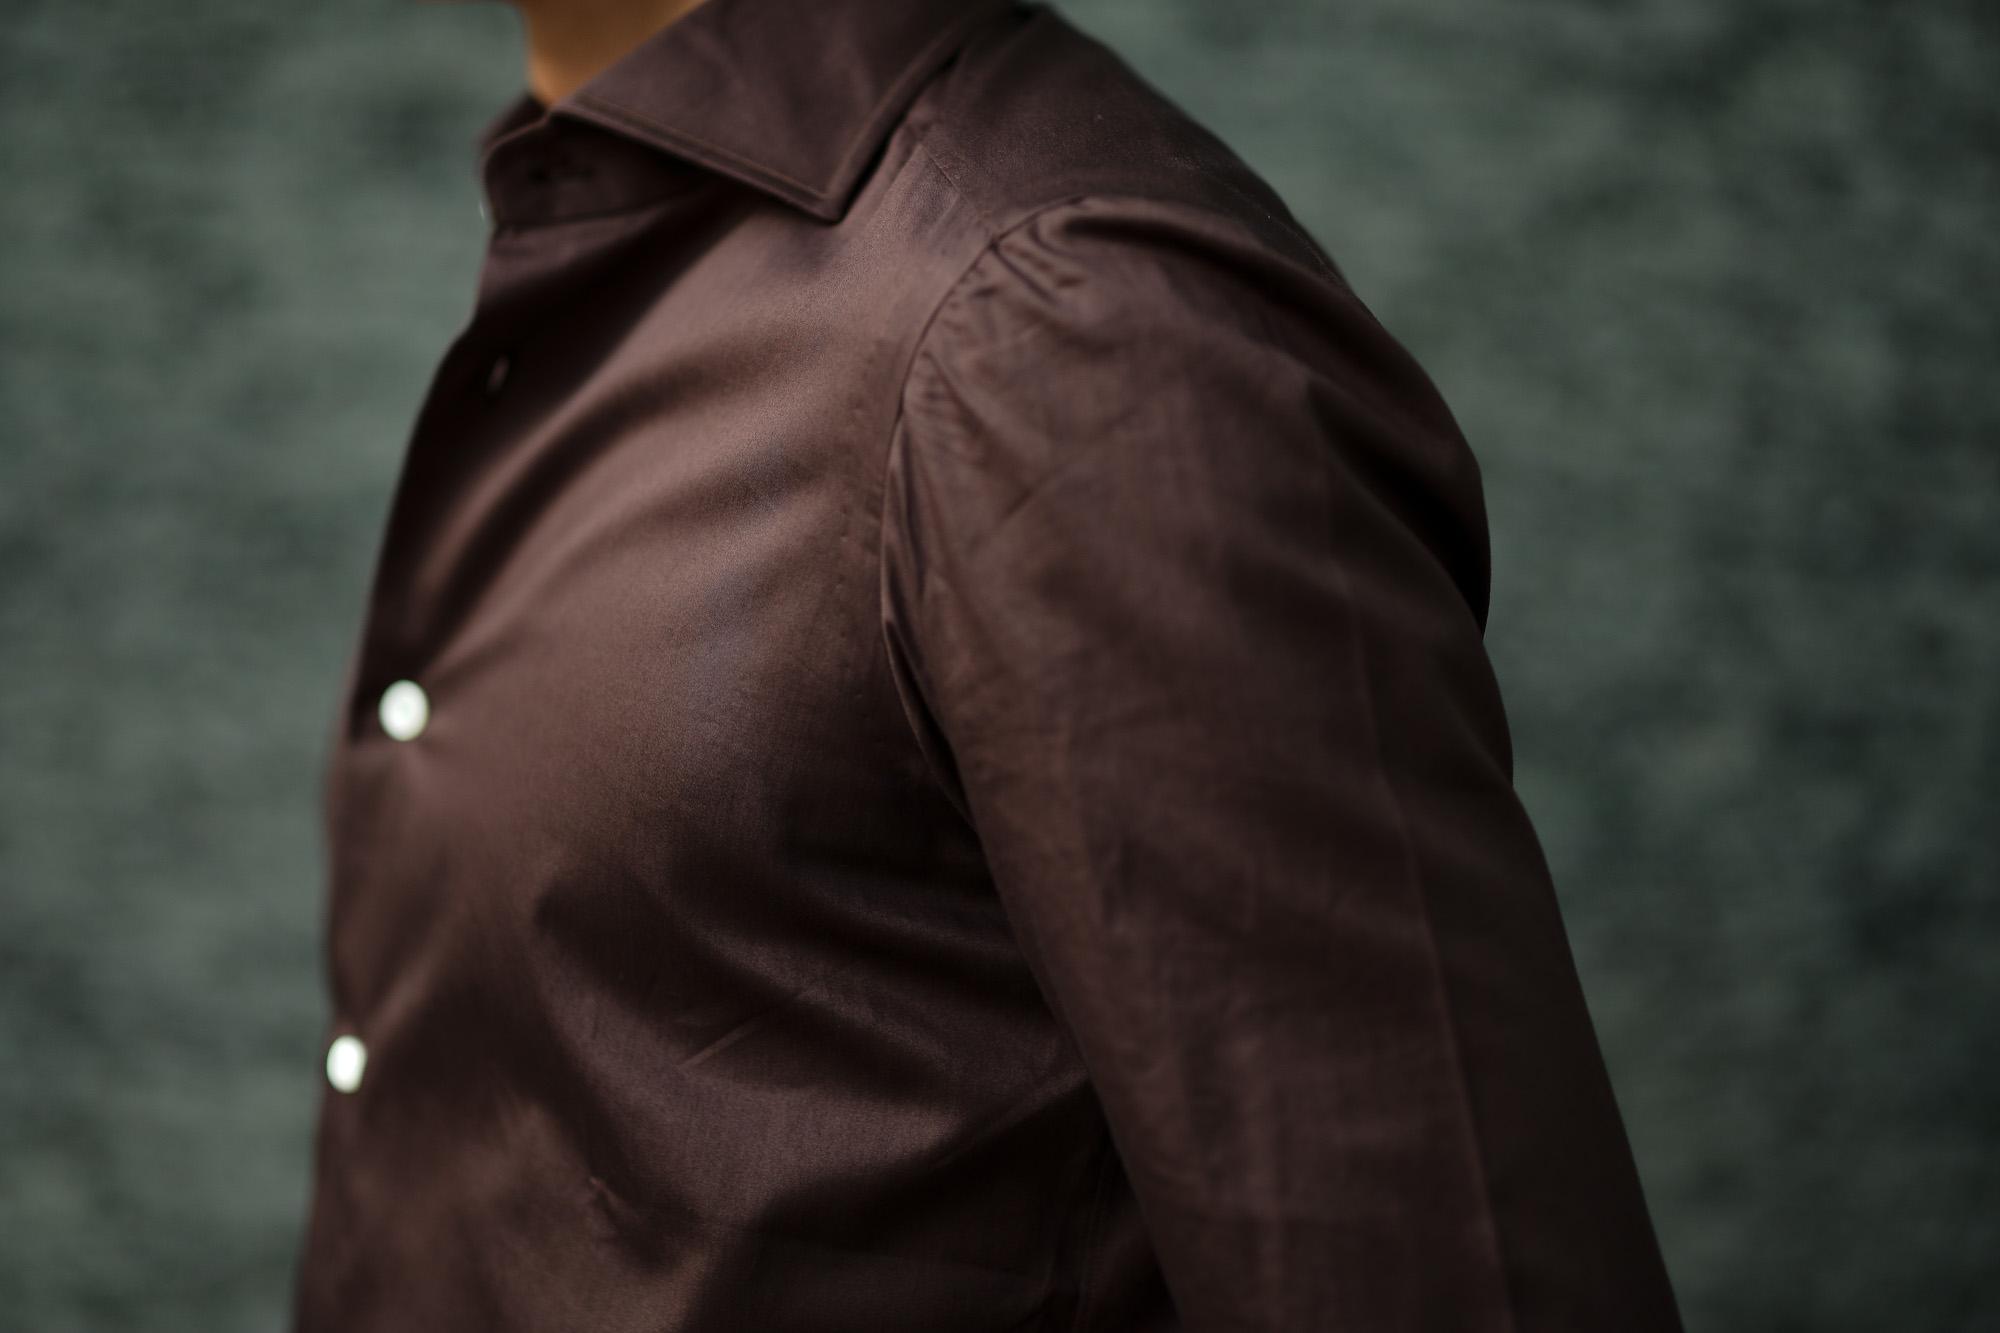 AVINO(アヴィーノ) Poplin Dress Shirts コットン ブロード ポプリン ドレスシャツ BROWN(ブラウン) made in italy (イタリア製) 2019 秋冬新作 愛知 名古屋 altoediritto アルトエデリット